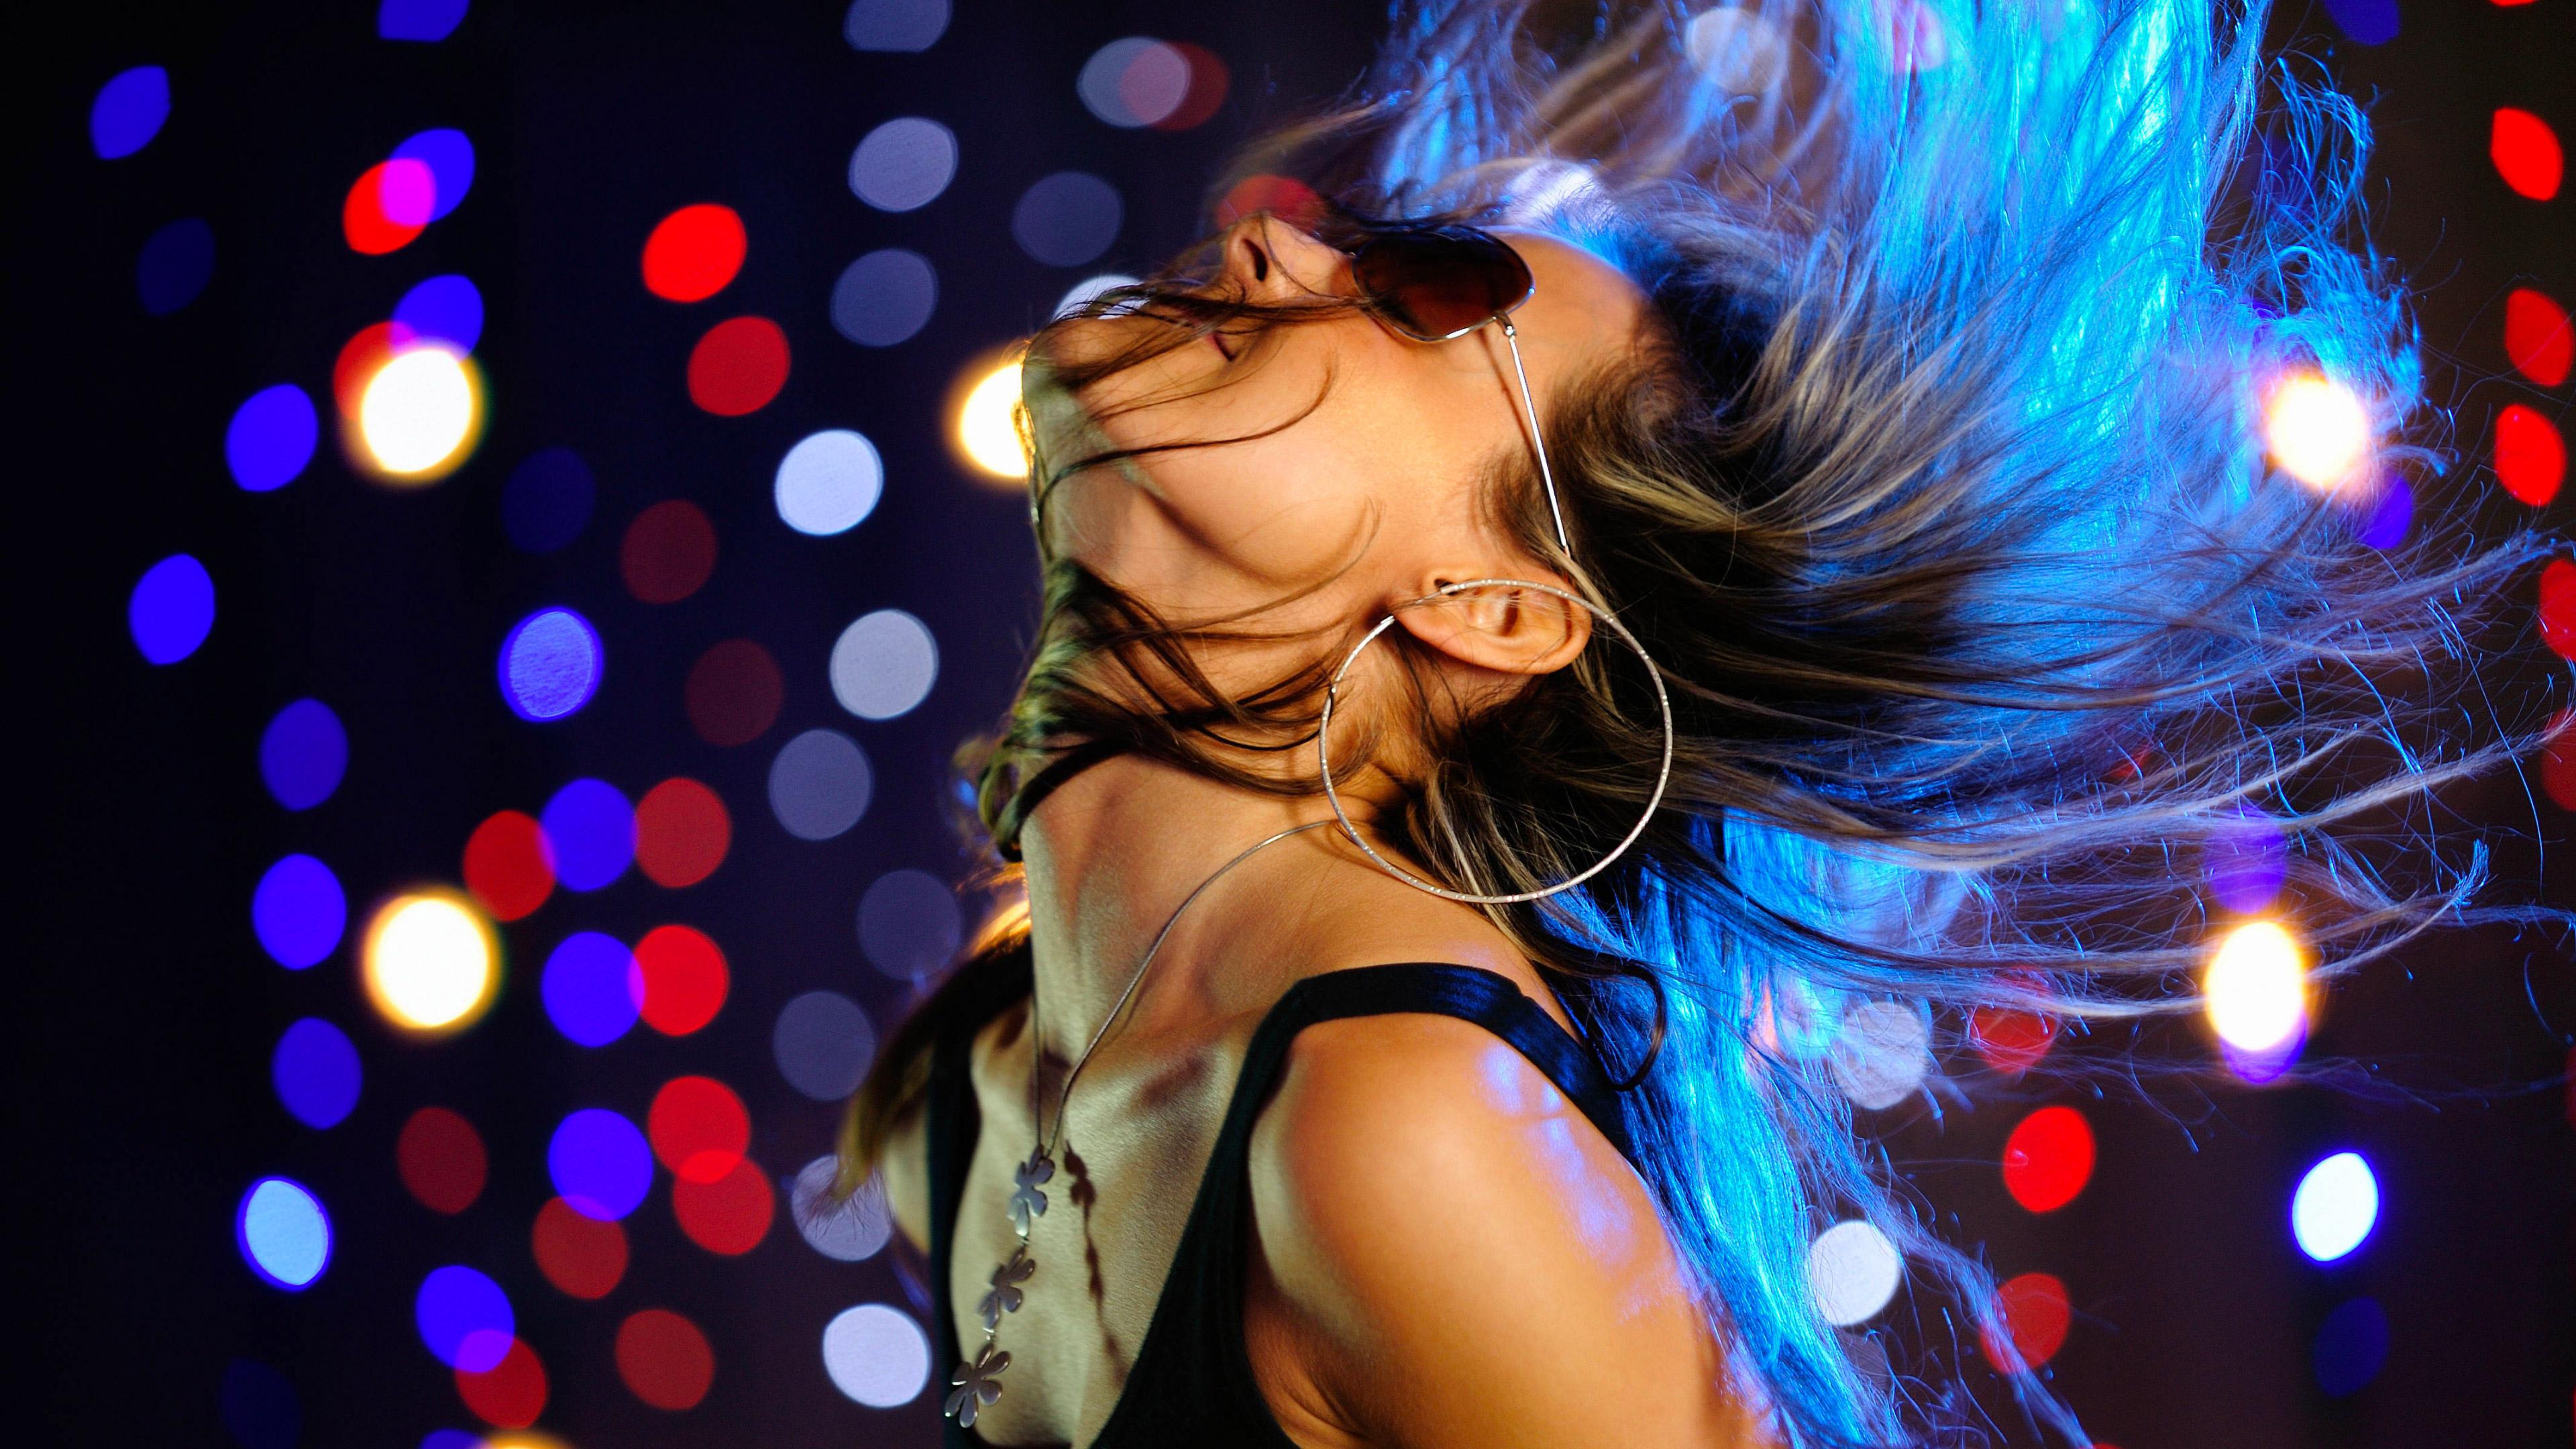 diskoteka klub devushka tanec dvizhenie volosy ochki ogni 77411 3840x2160 - Влияние популярных танцевальных стилей на характер